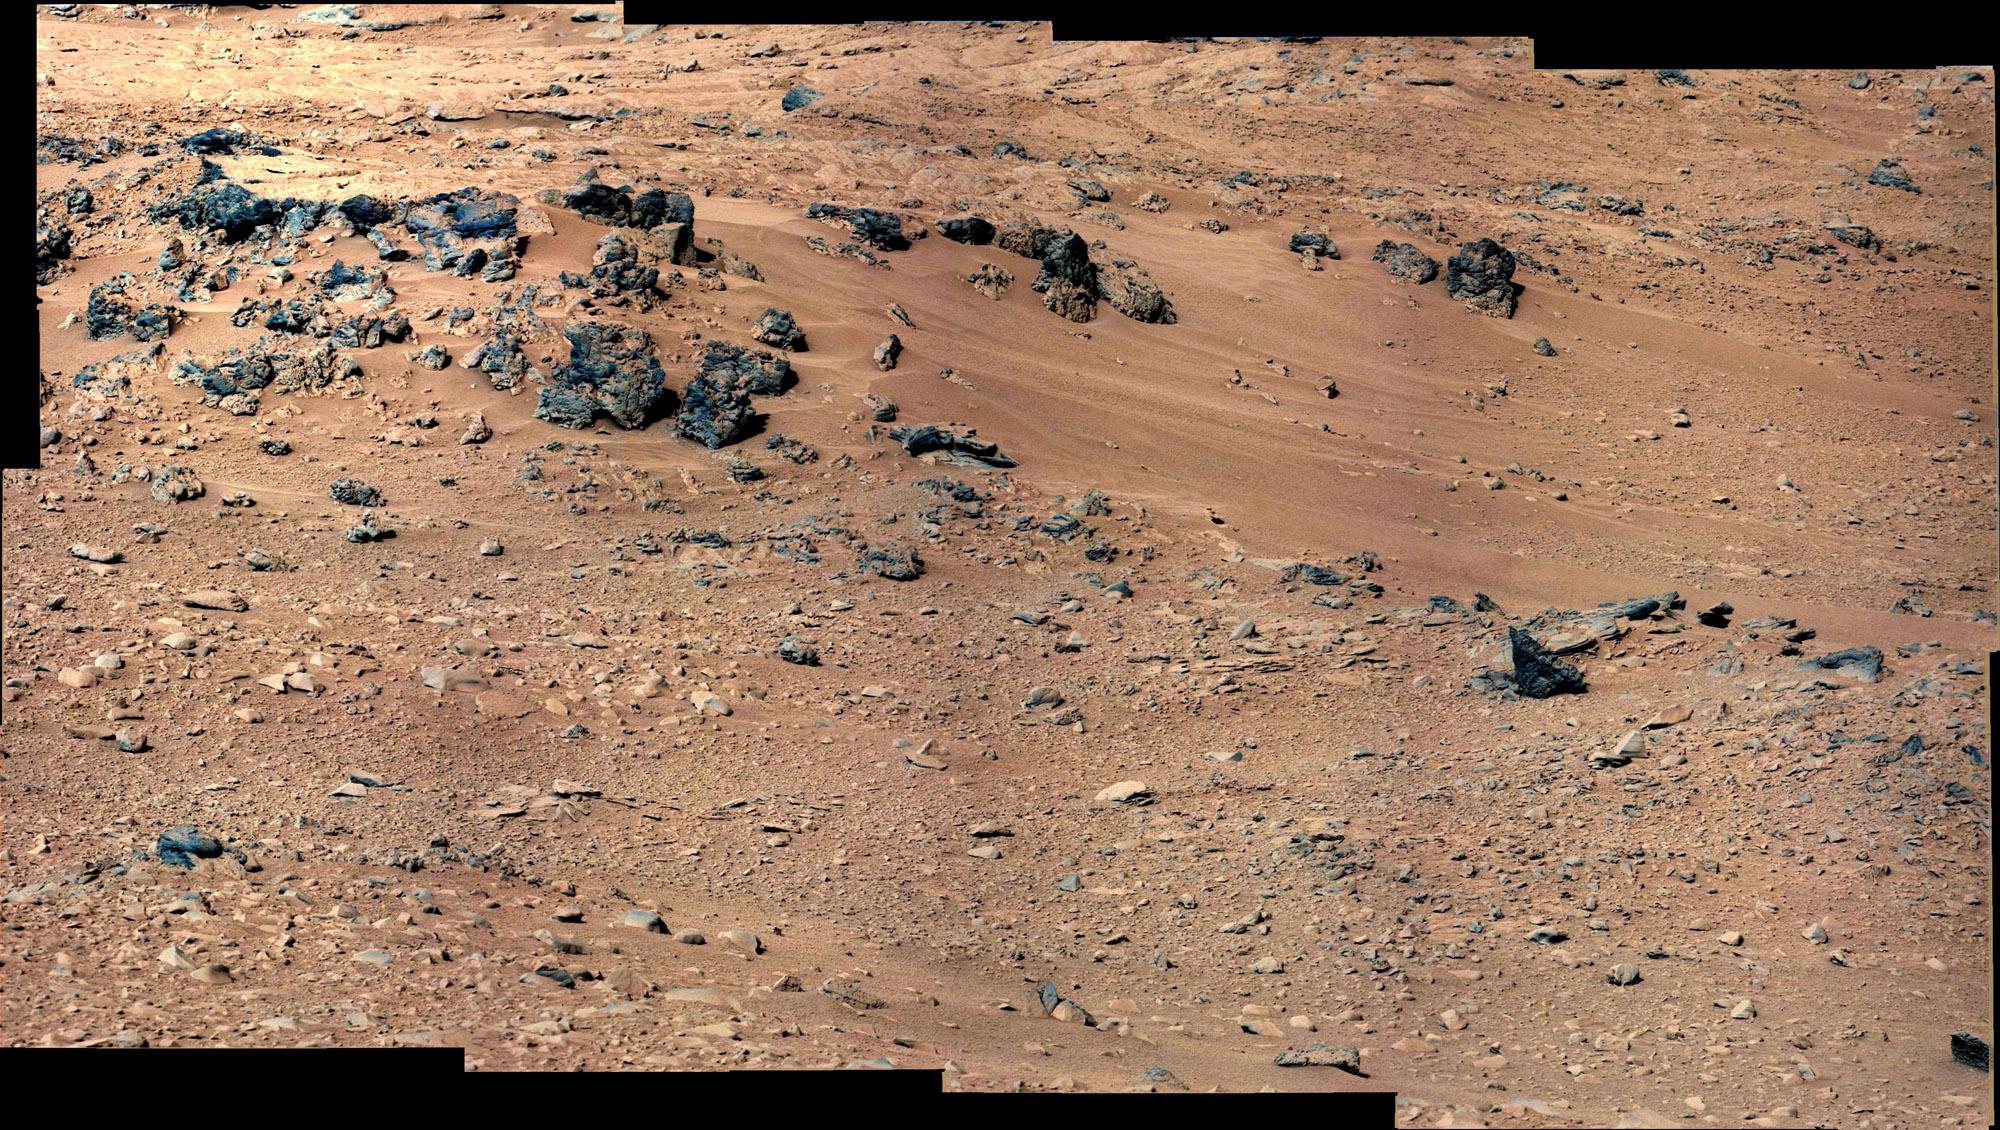 Has NASA's Curiosity Rover Found Clues to Life's Building Blocks on Mars?